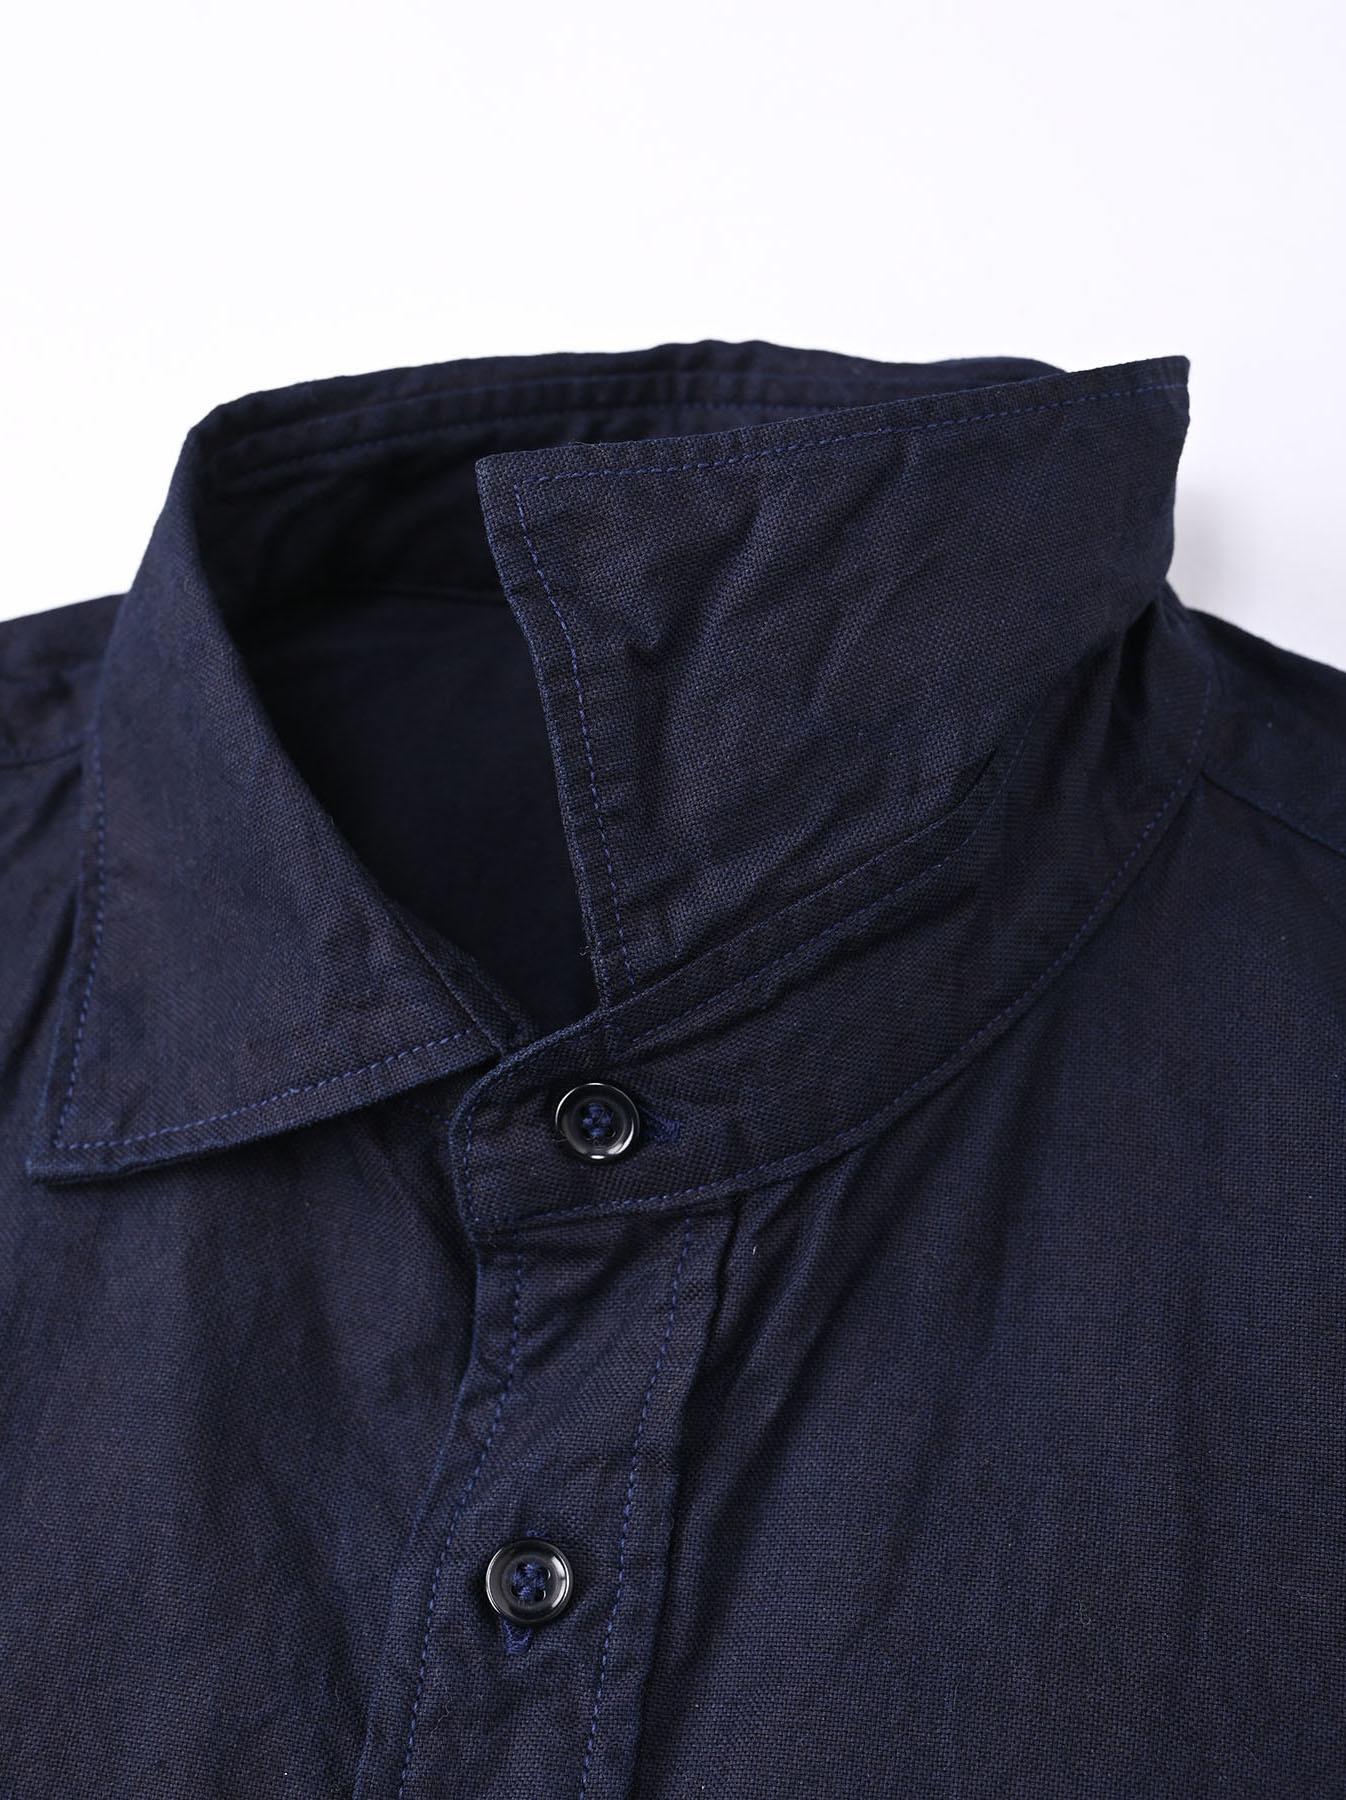 Indigo  Zimbabwe Oxford 908 Regular Shirt-11